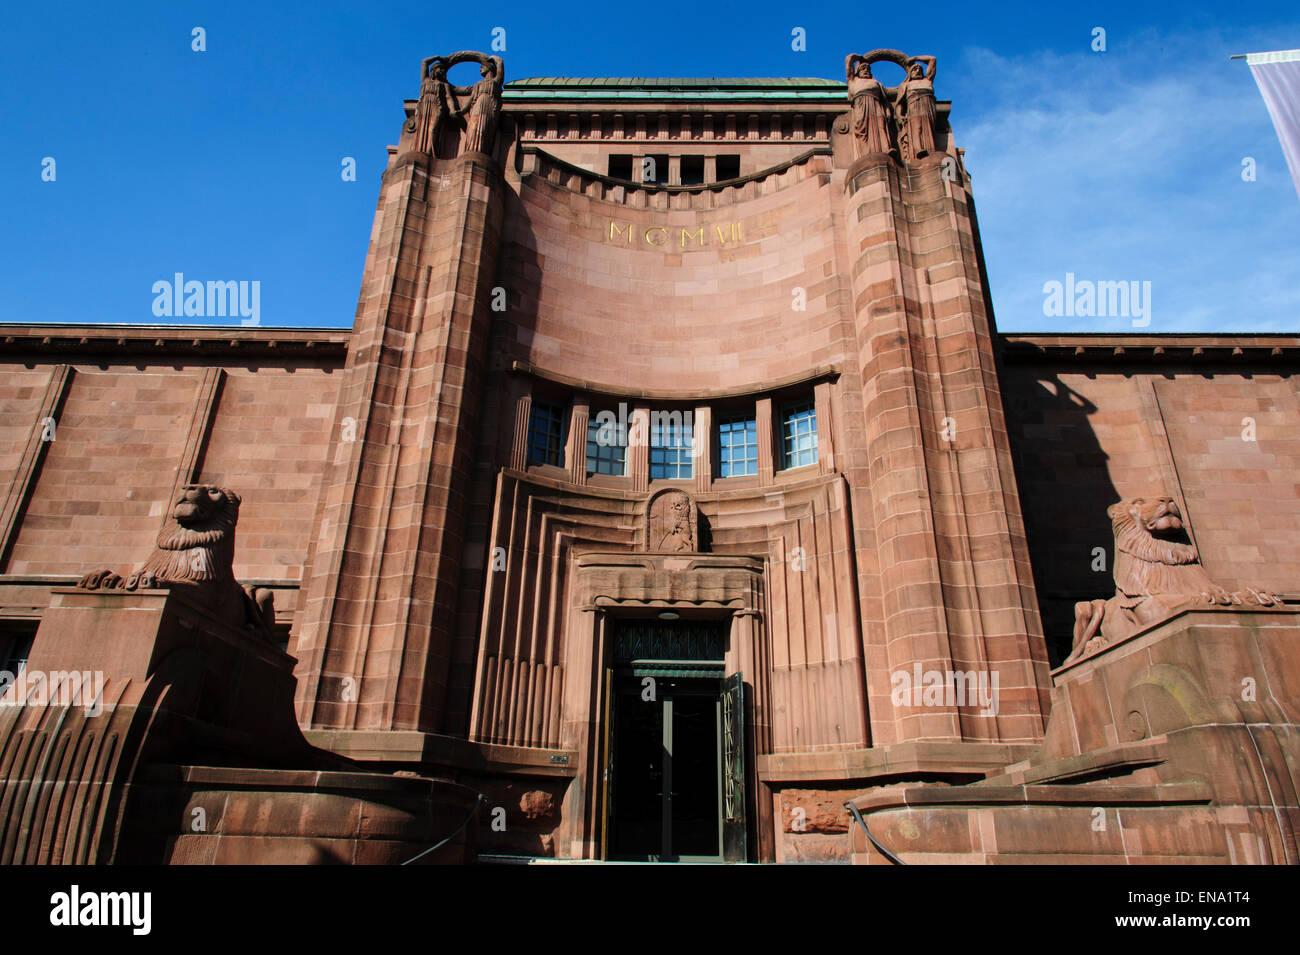 La Kunsthalle di Mannheim, Baden-Württemberg, Deutschland | Sala delle Arti (Kunsthalle) Mannheim, Baden-Württemberg, Immagini Stock